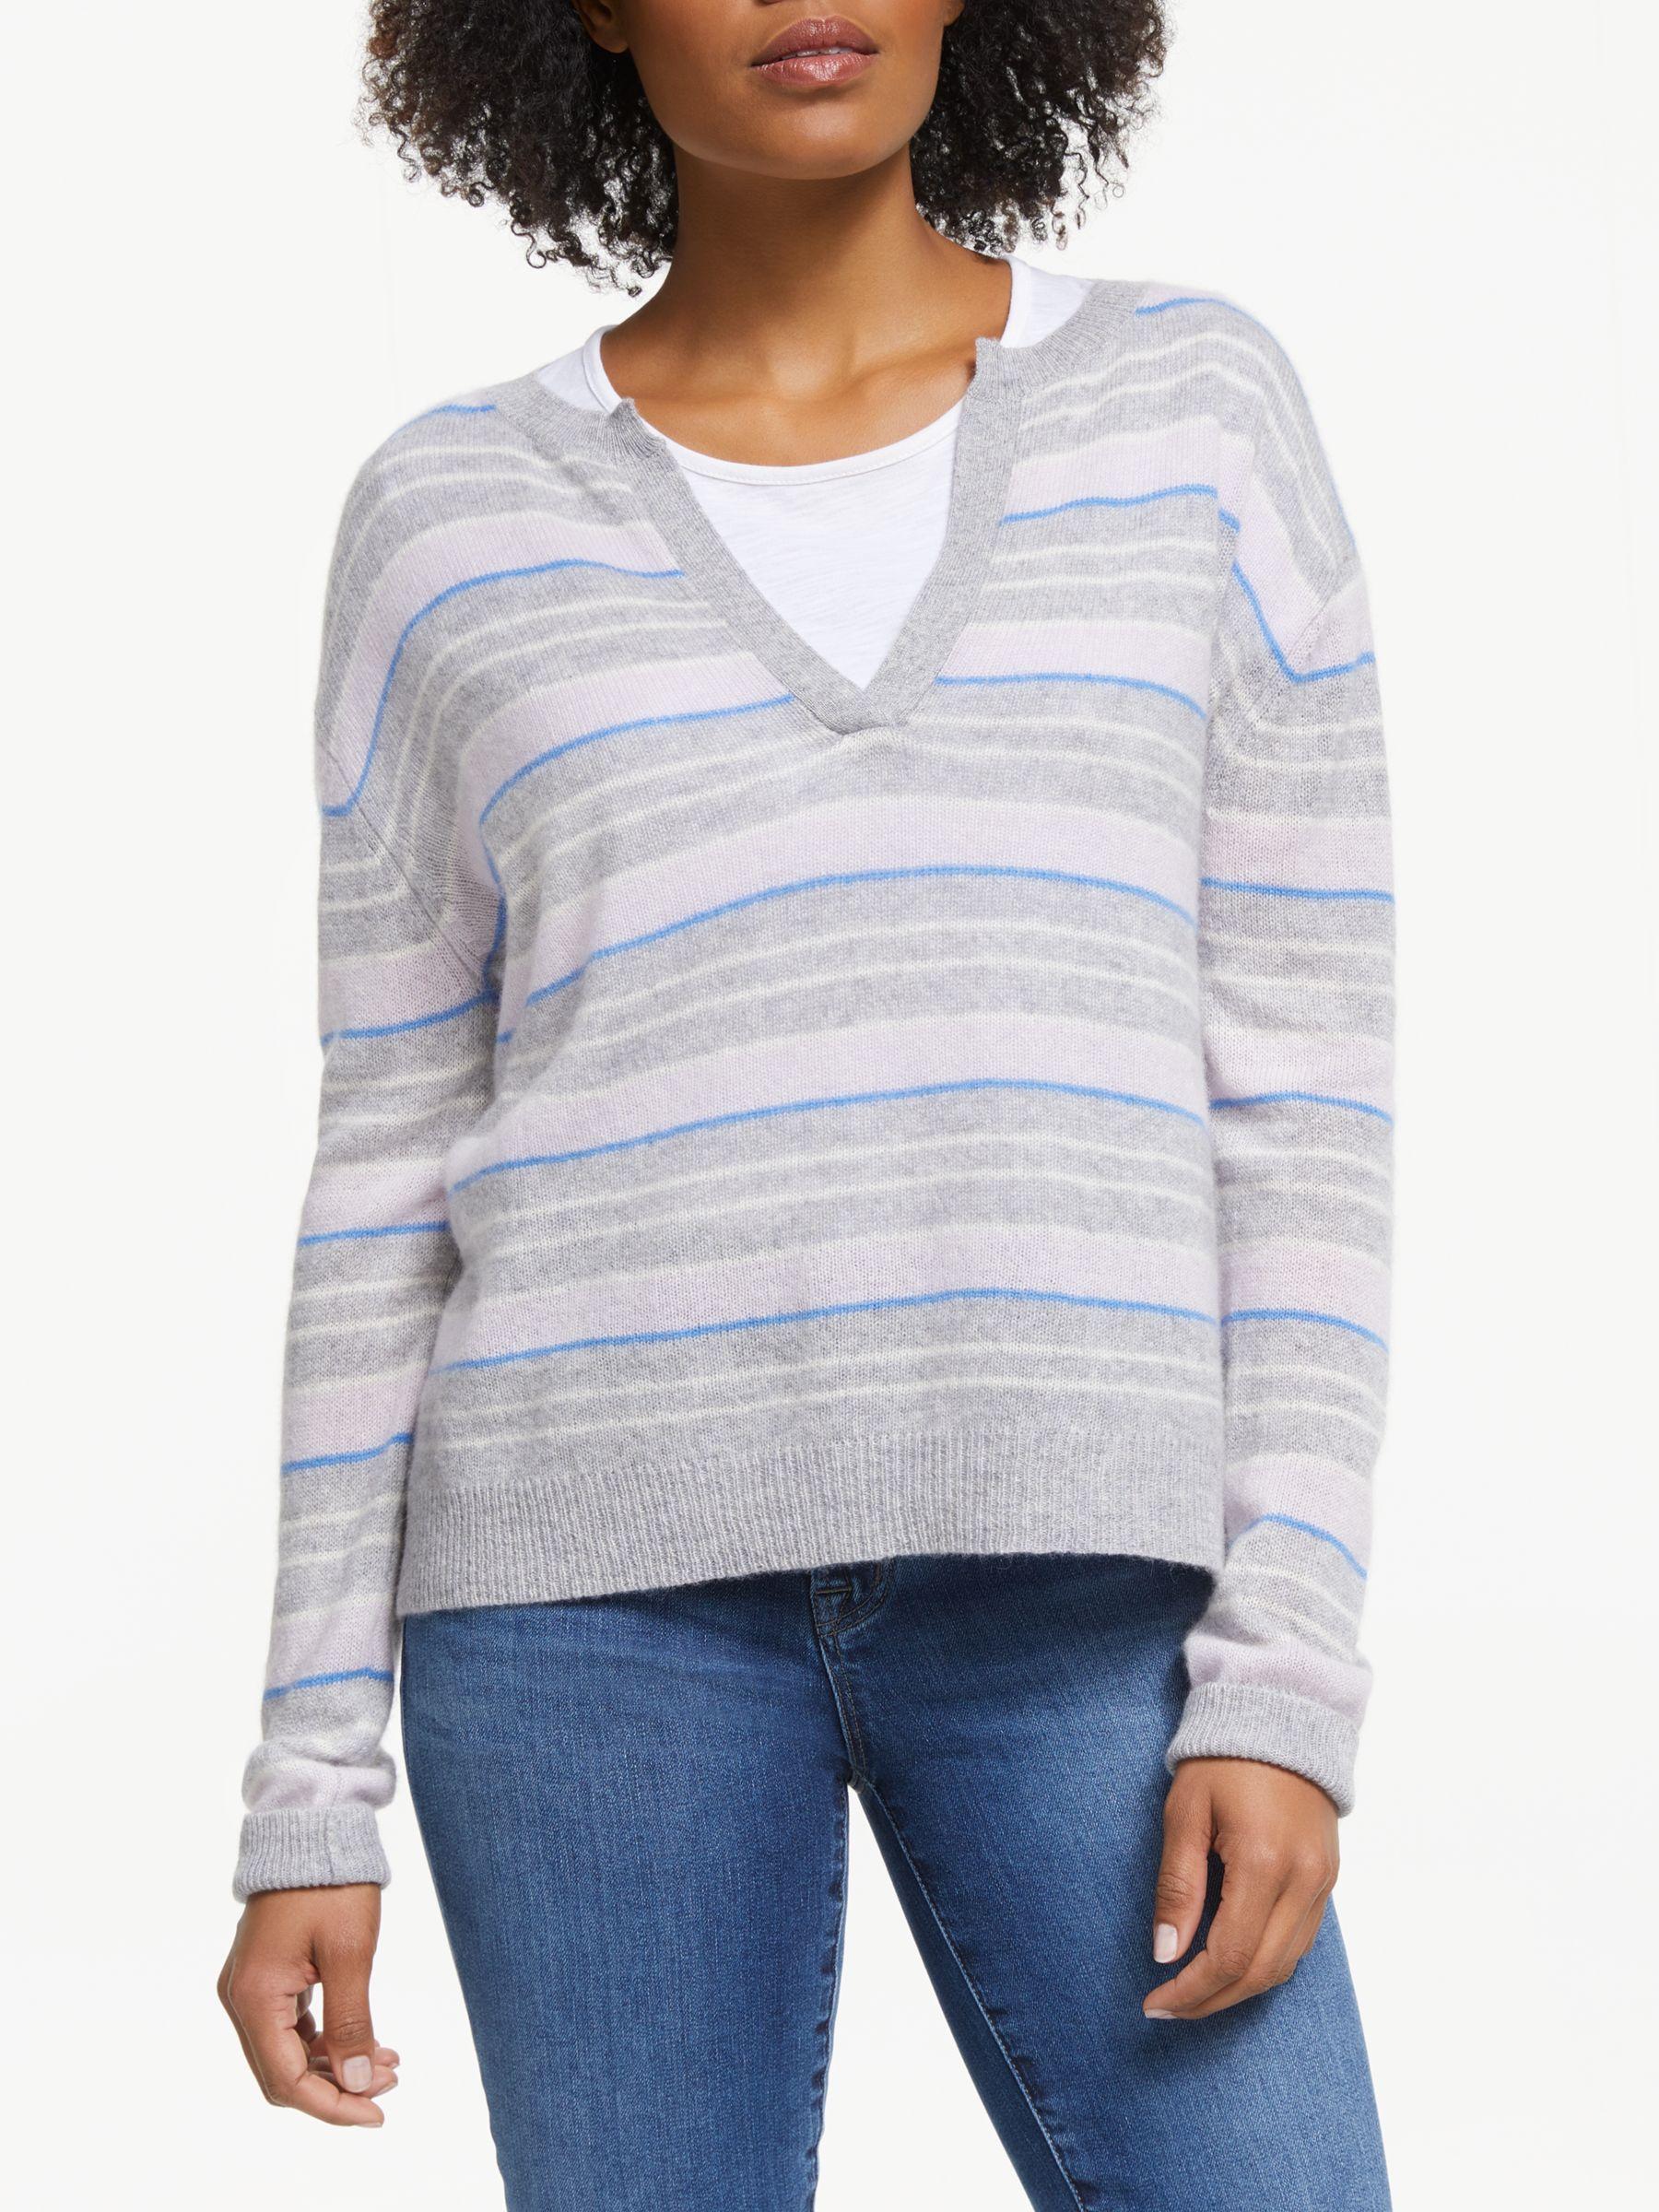 360 Sweater Rosa Stripe Cashmere Jumper, Heather Grey at